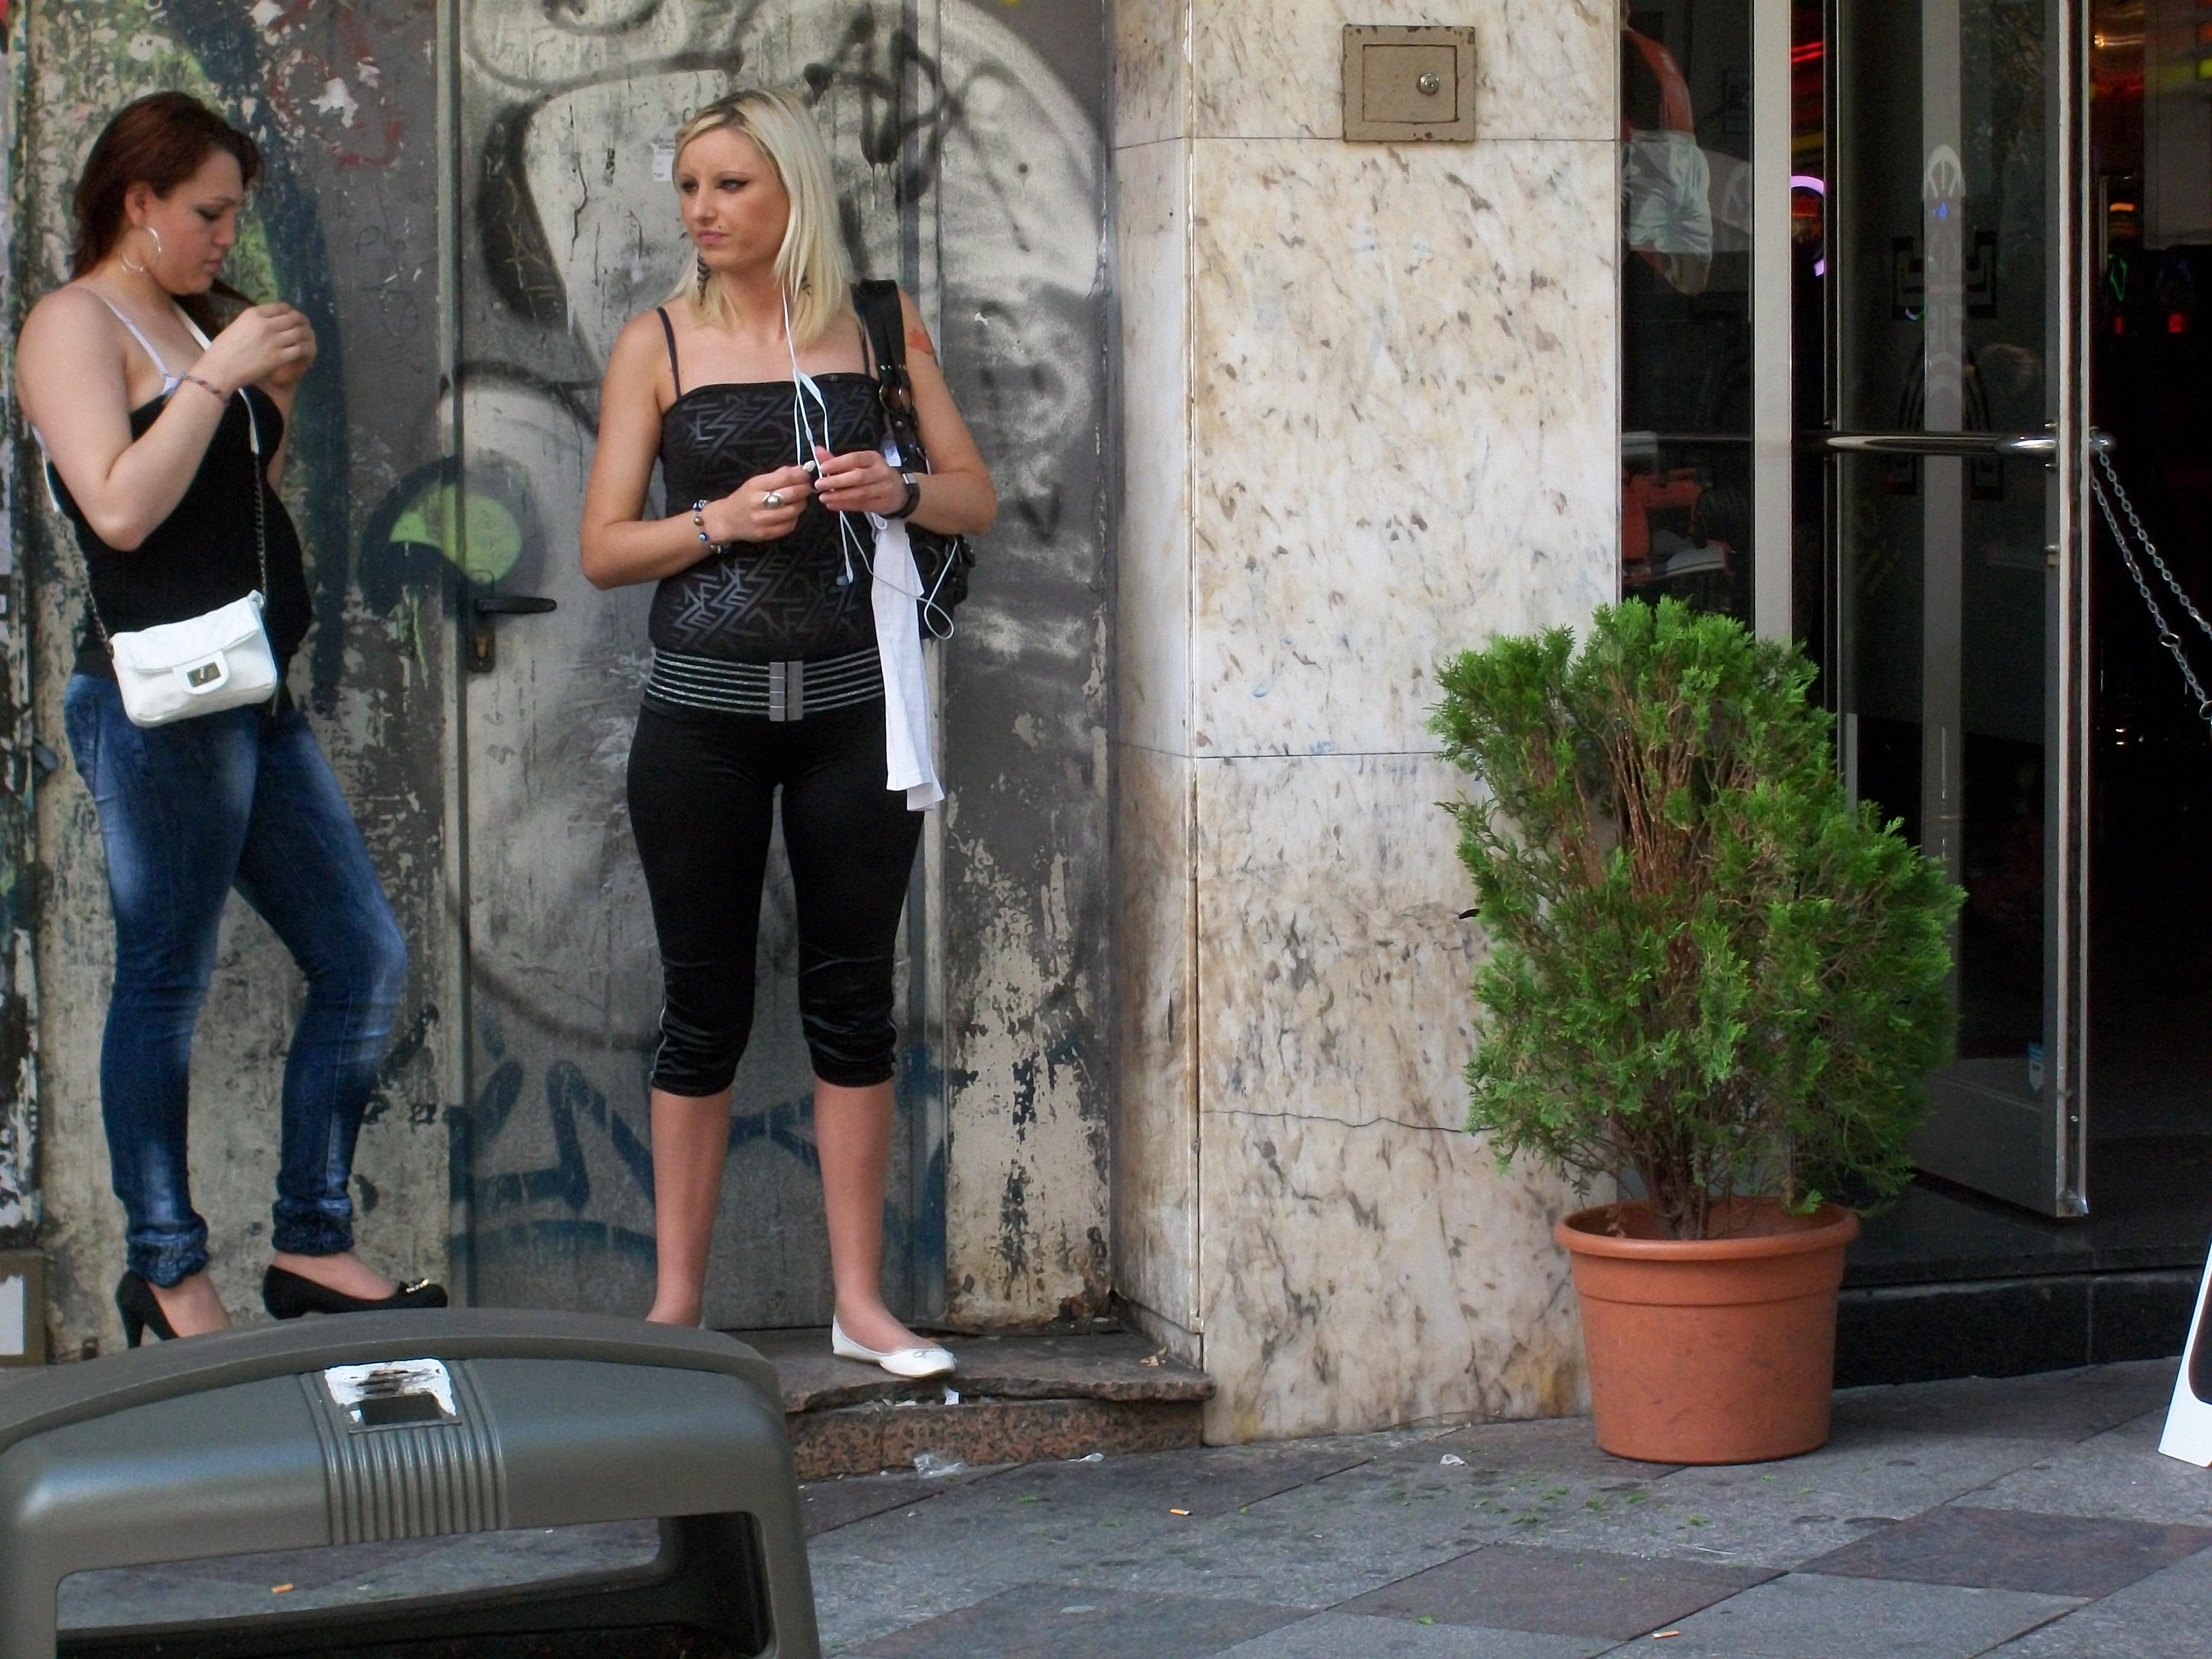 In Spain Prostitution